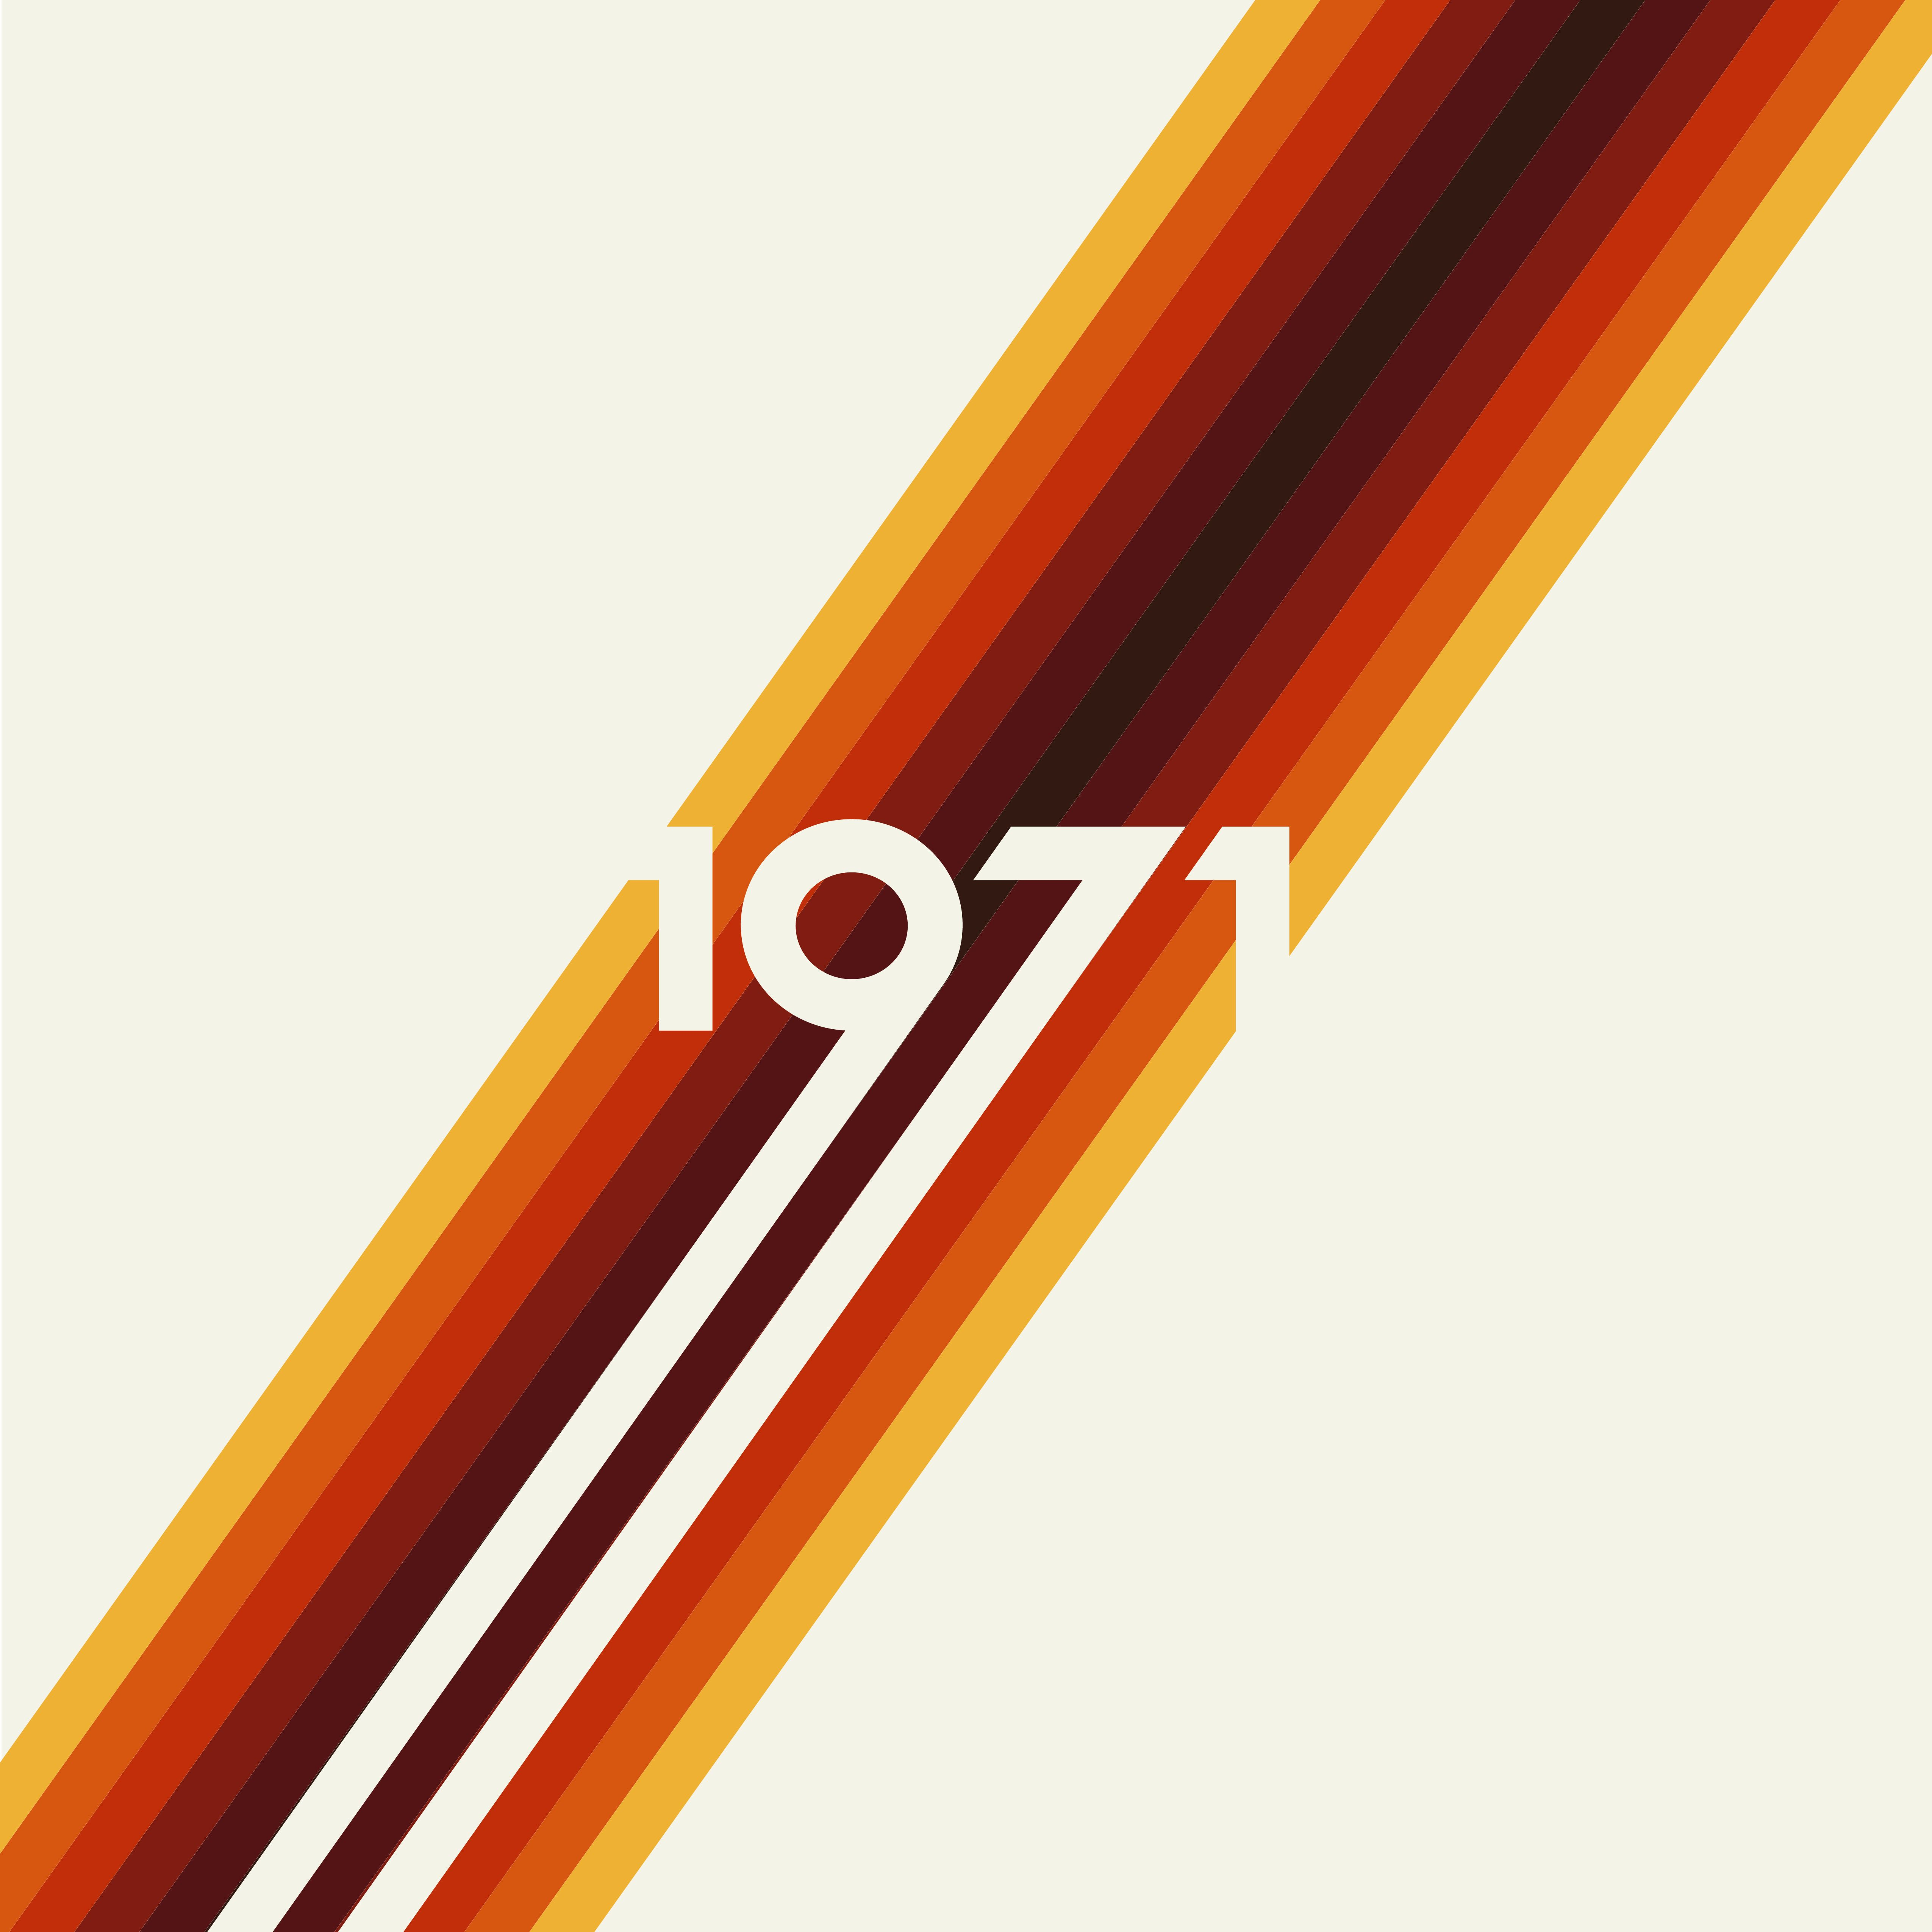 1971 - yearproject - ben lalisan